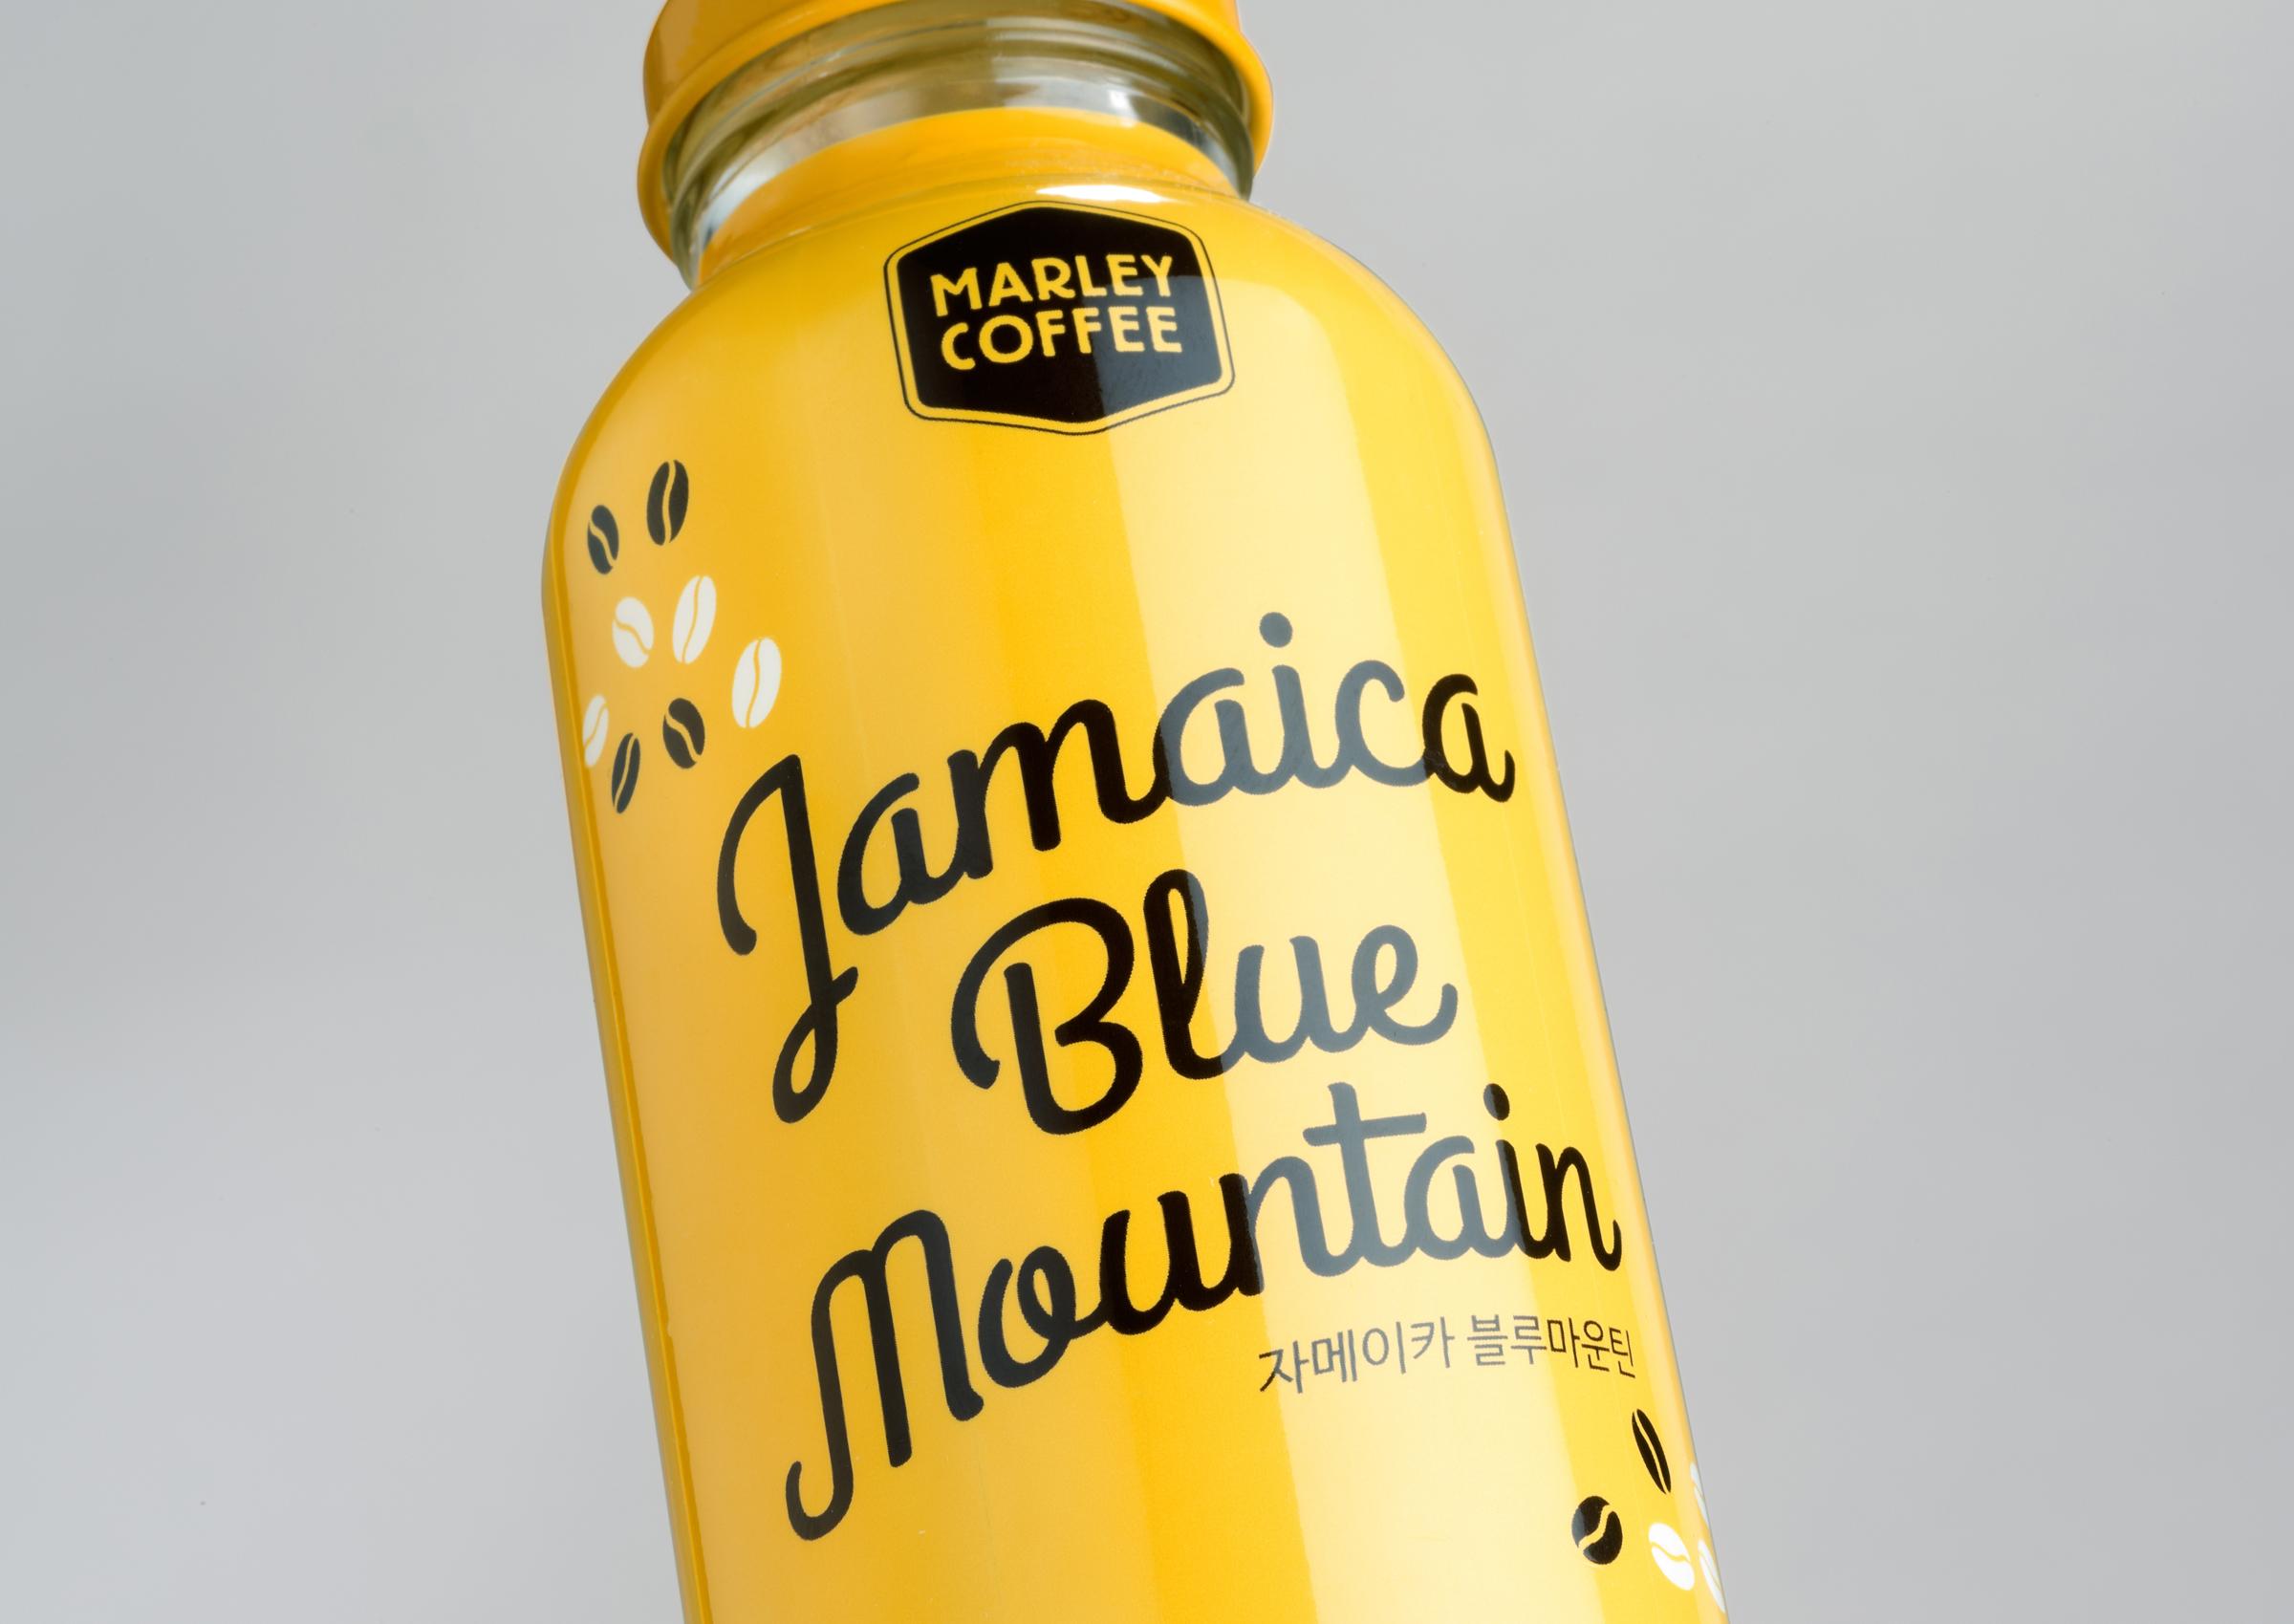 Marley Coffee by Yang Ripol -3.jpg